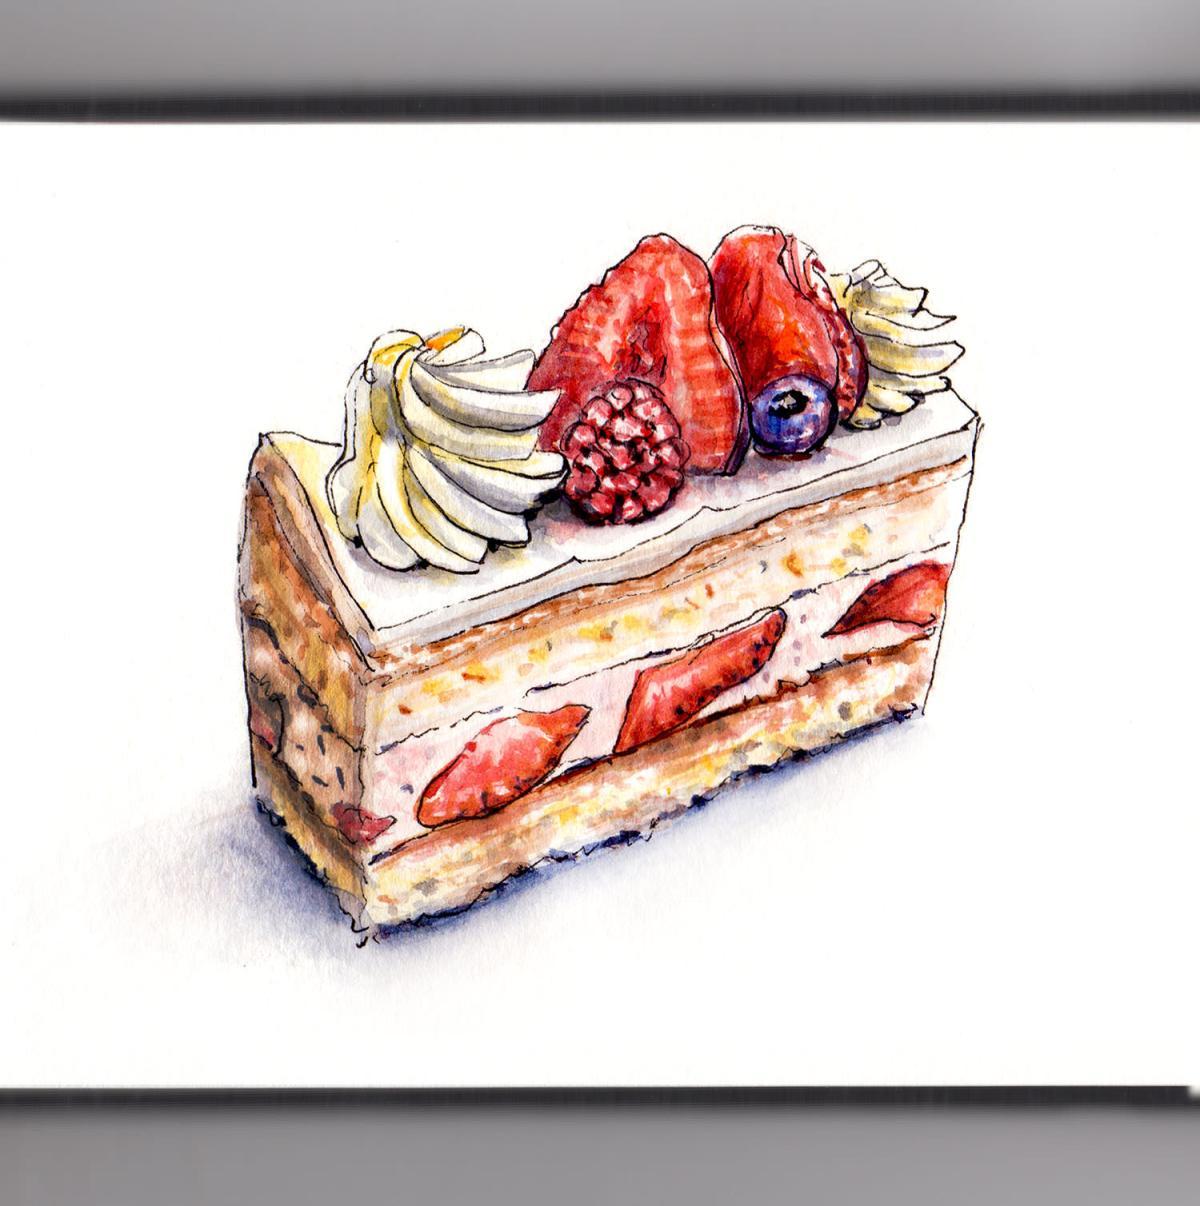 Day 19 - #WorldWatercolorGroup - Strawberry Sponge Cake Slice - #doodlewash